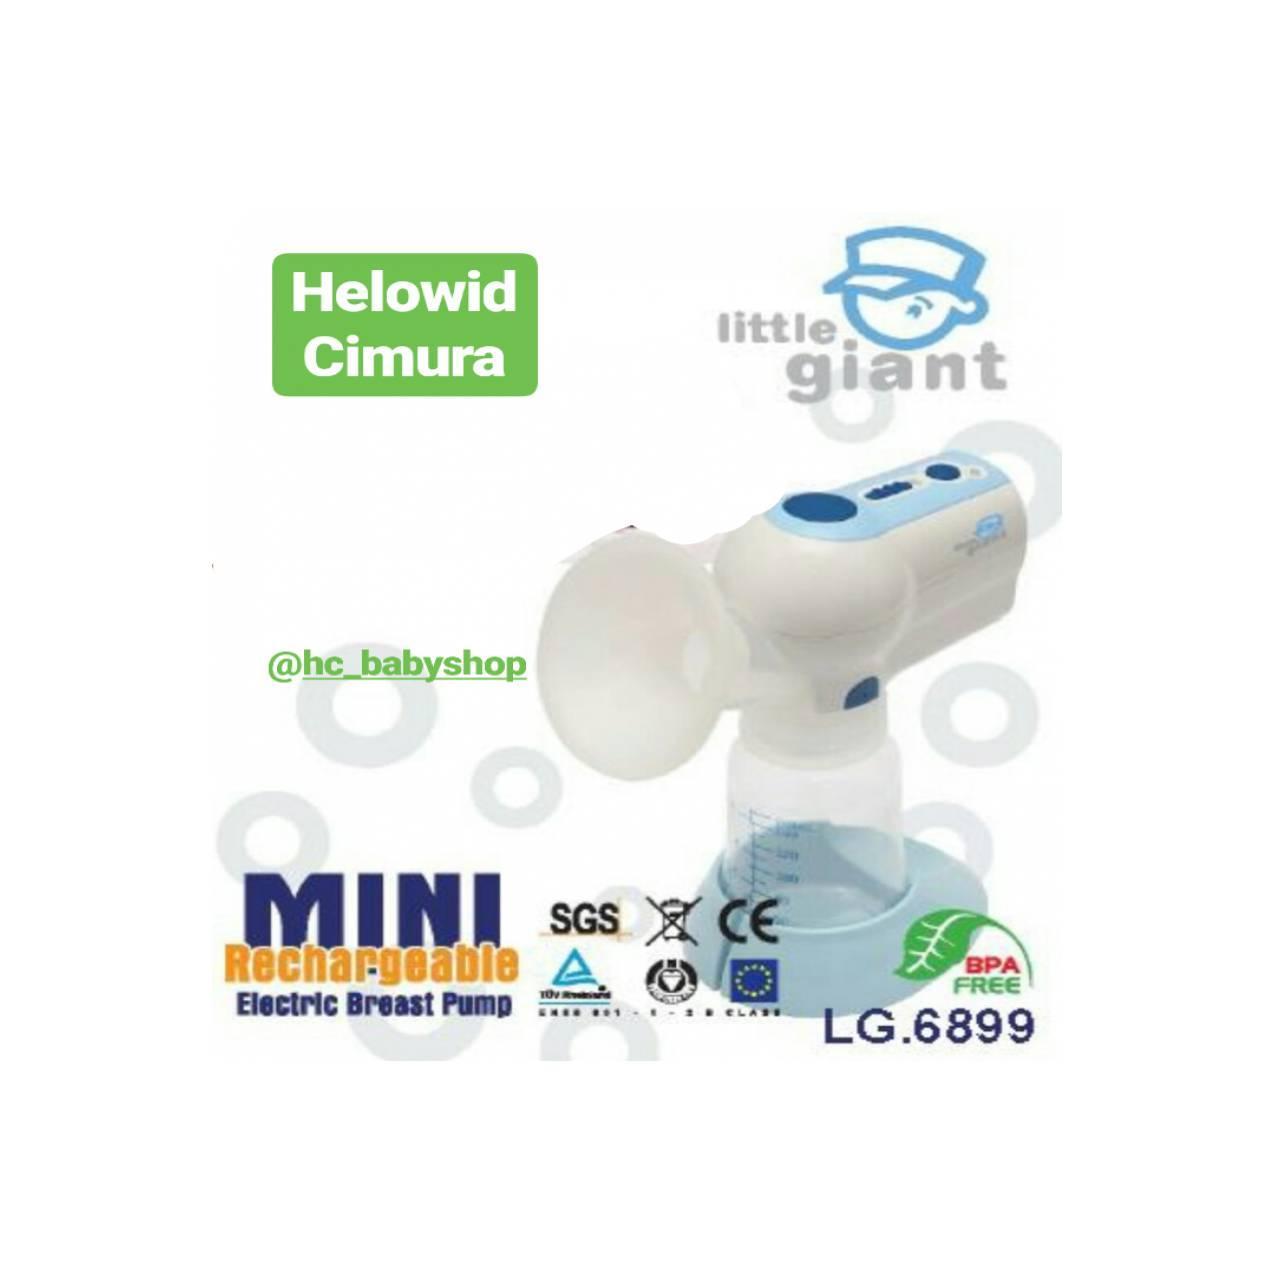 Little Giant Mini Electrik Breast Pump Rechargeable Lg6899 Update Obebe Electronic 3 Levels Battery